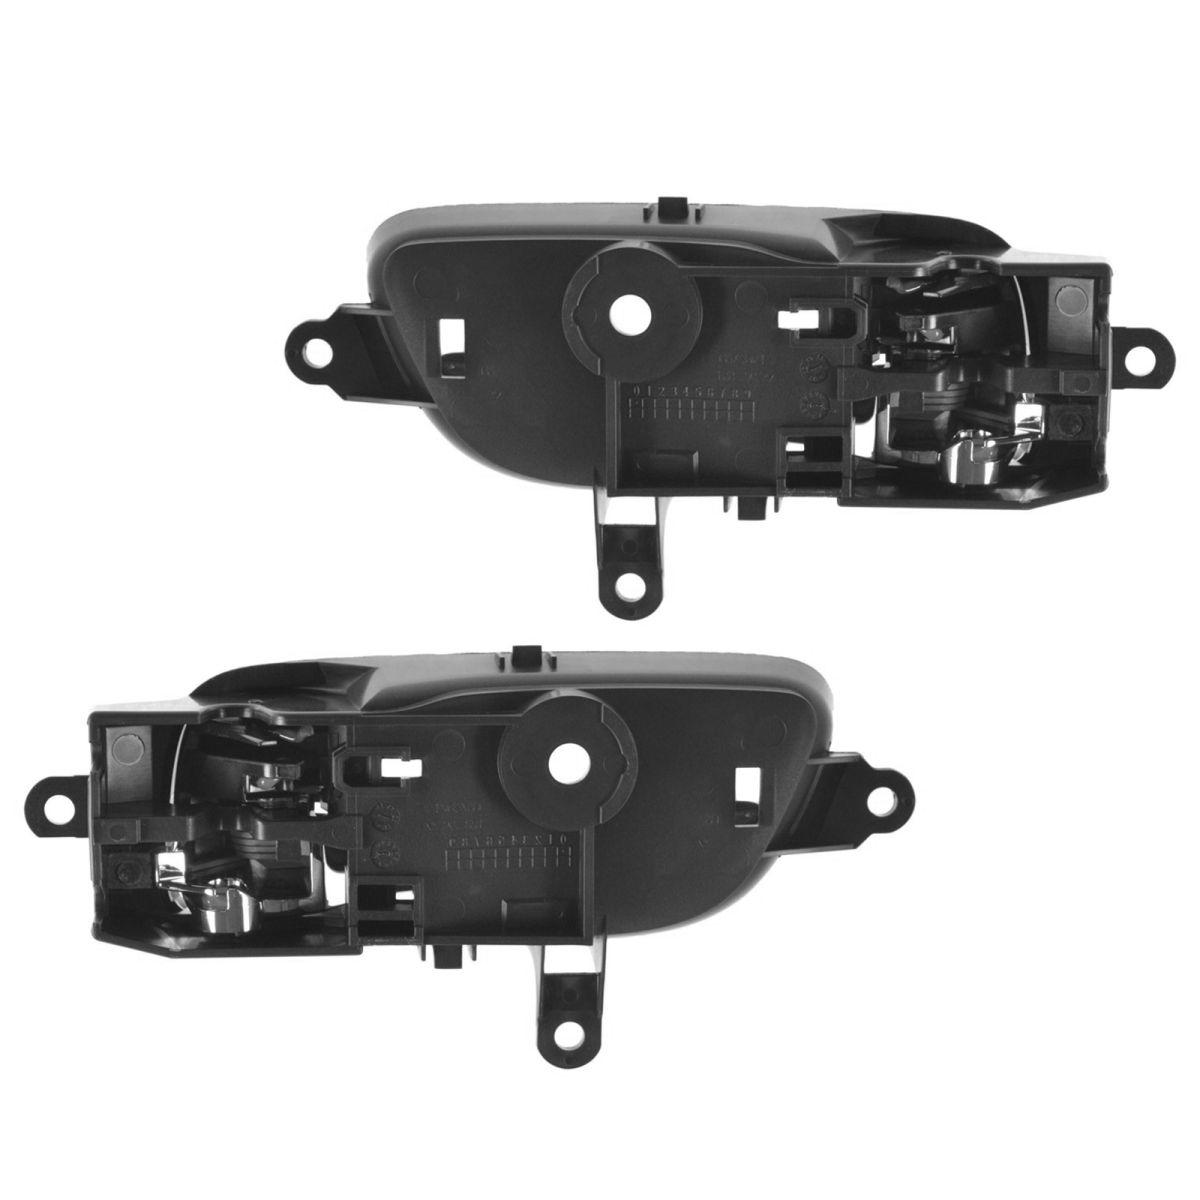 OEM Inside Interior Door Handle Black & Chrome LH & RH Pair for Nissan Truck New